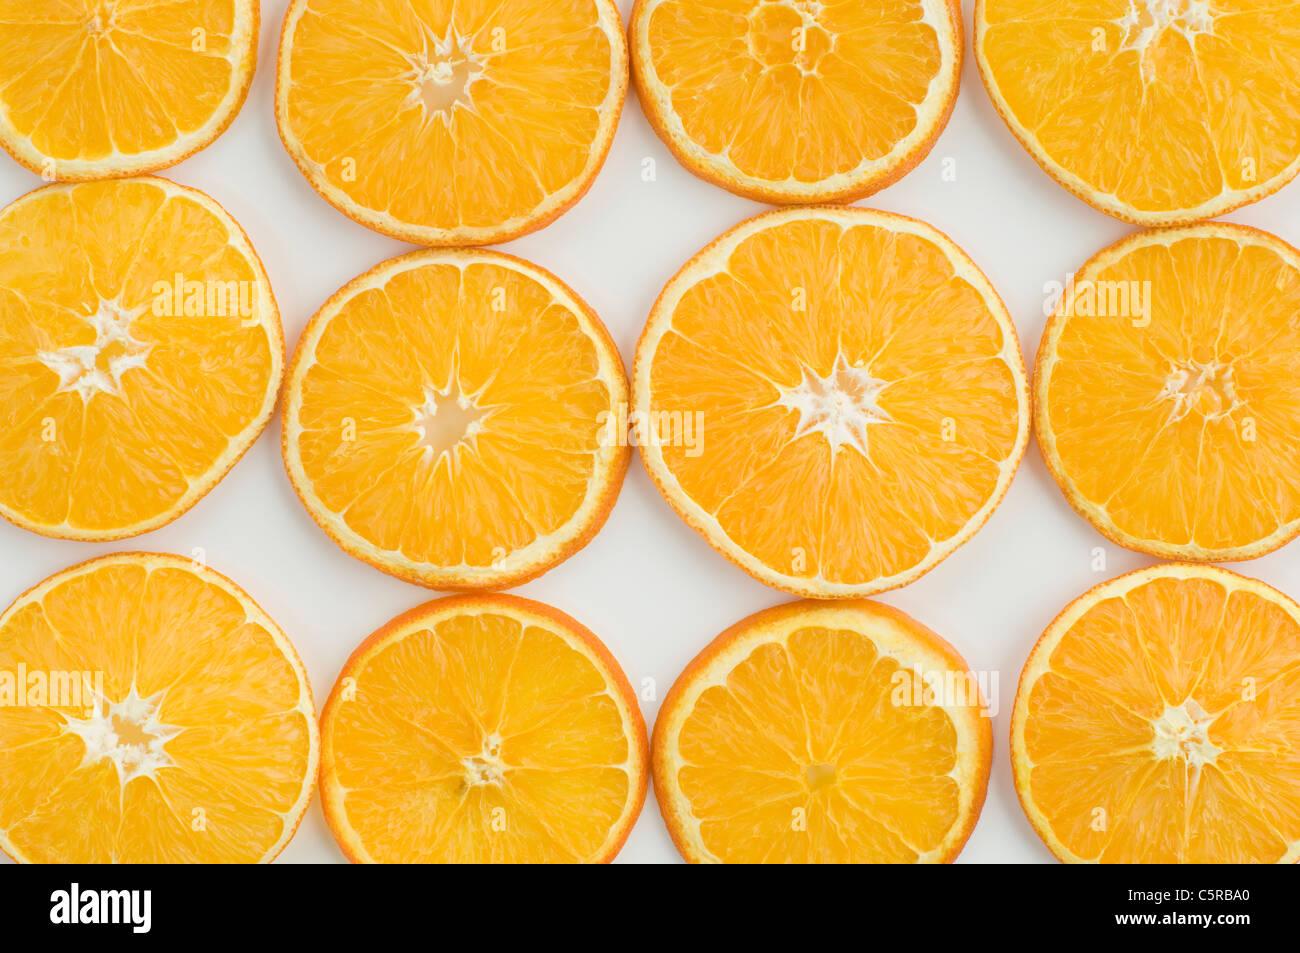 Close up of orange slices against white background, full frame - Stock Image